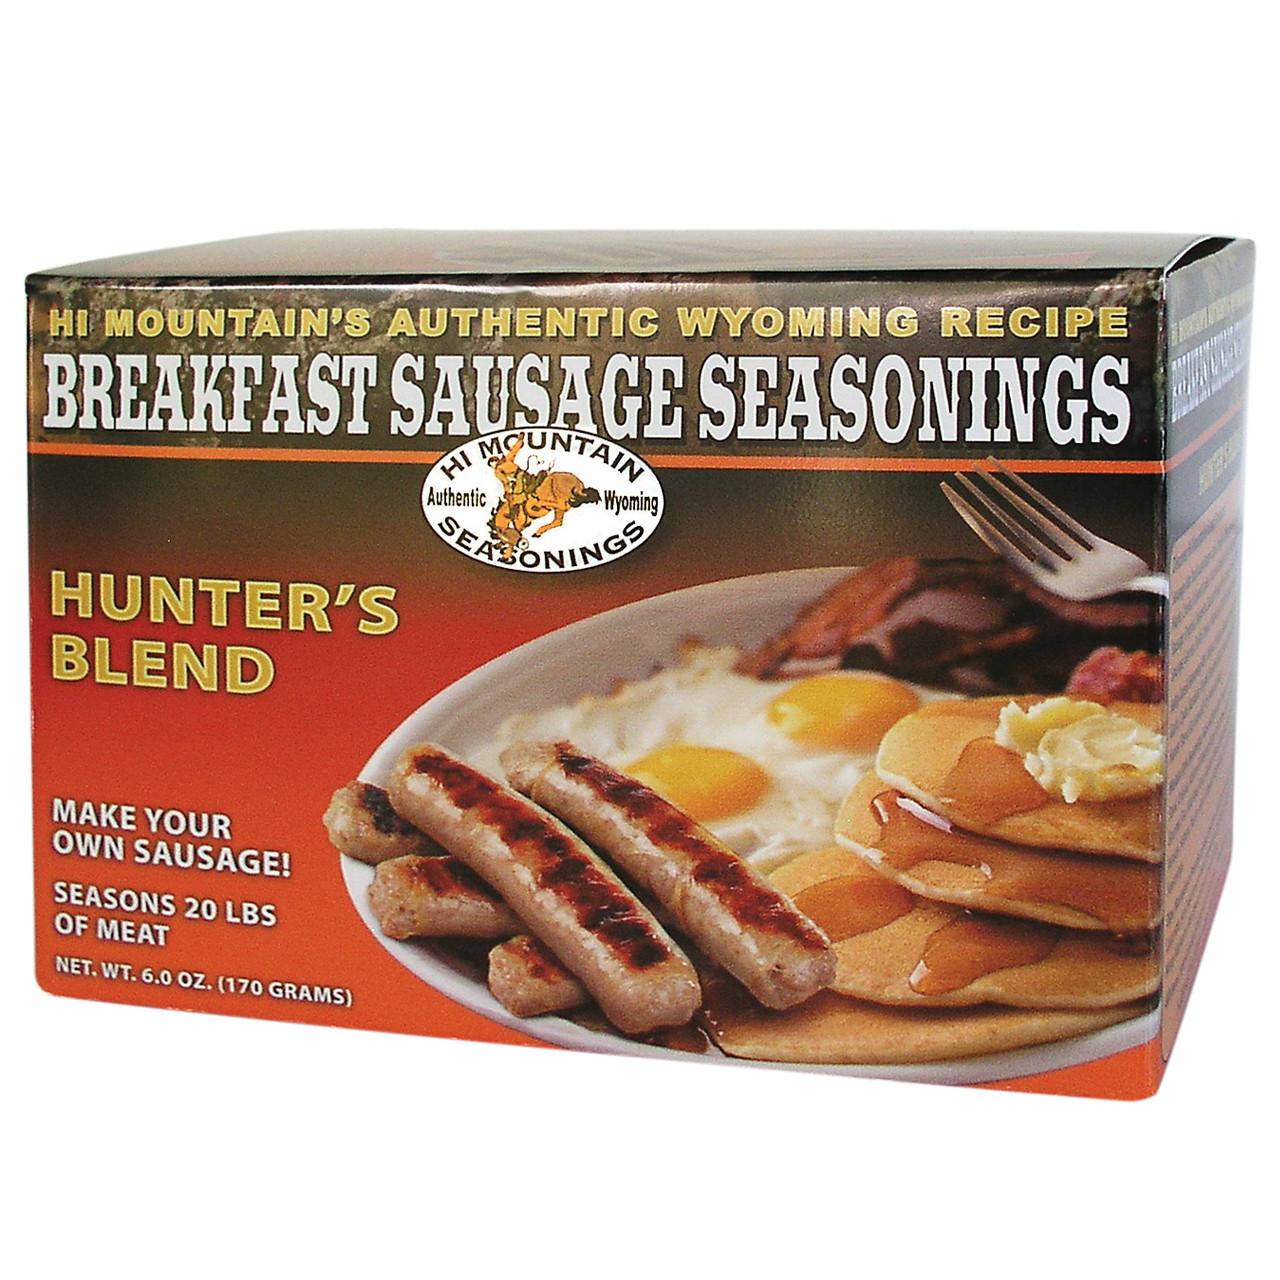 Hunter's Blend Breakfast Sausage Seasoning